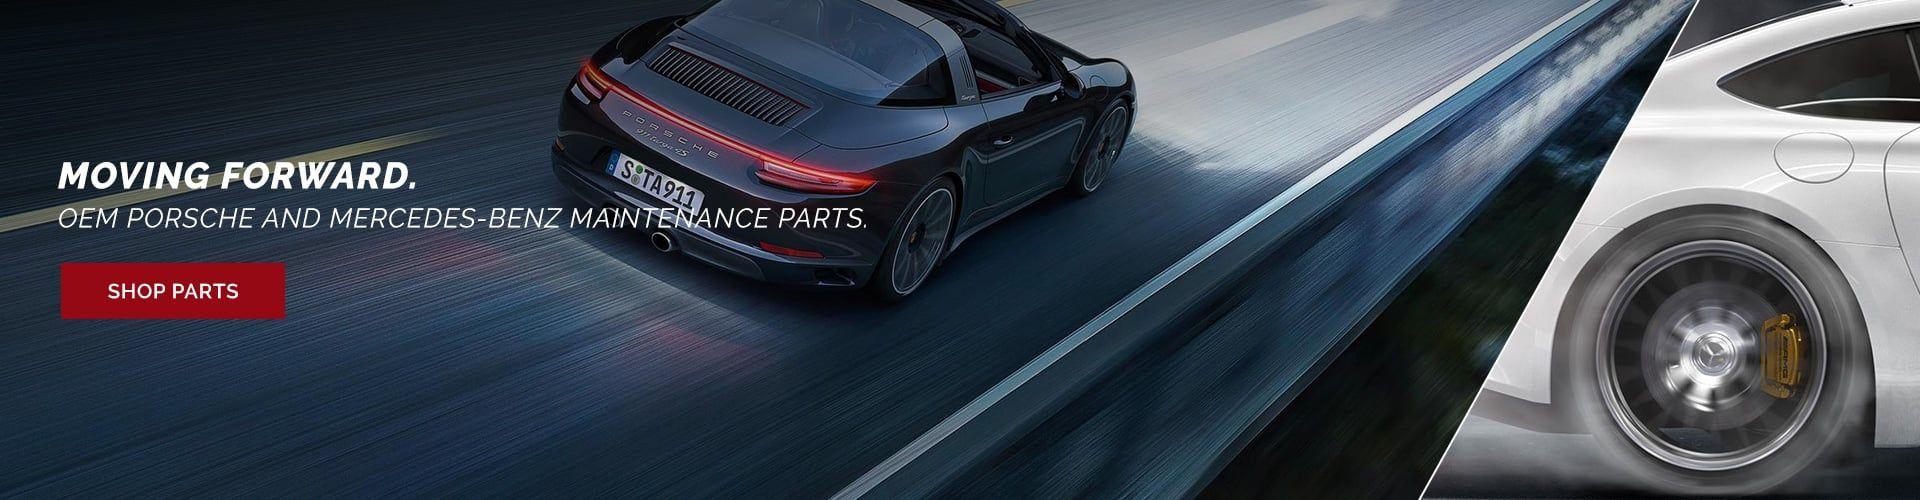 Porsche and Mercedes-Benz Maintenance Parts